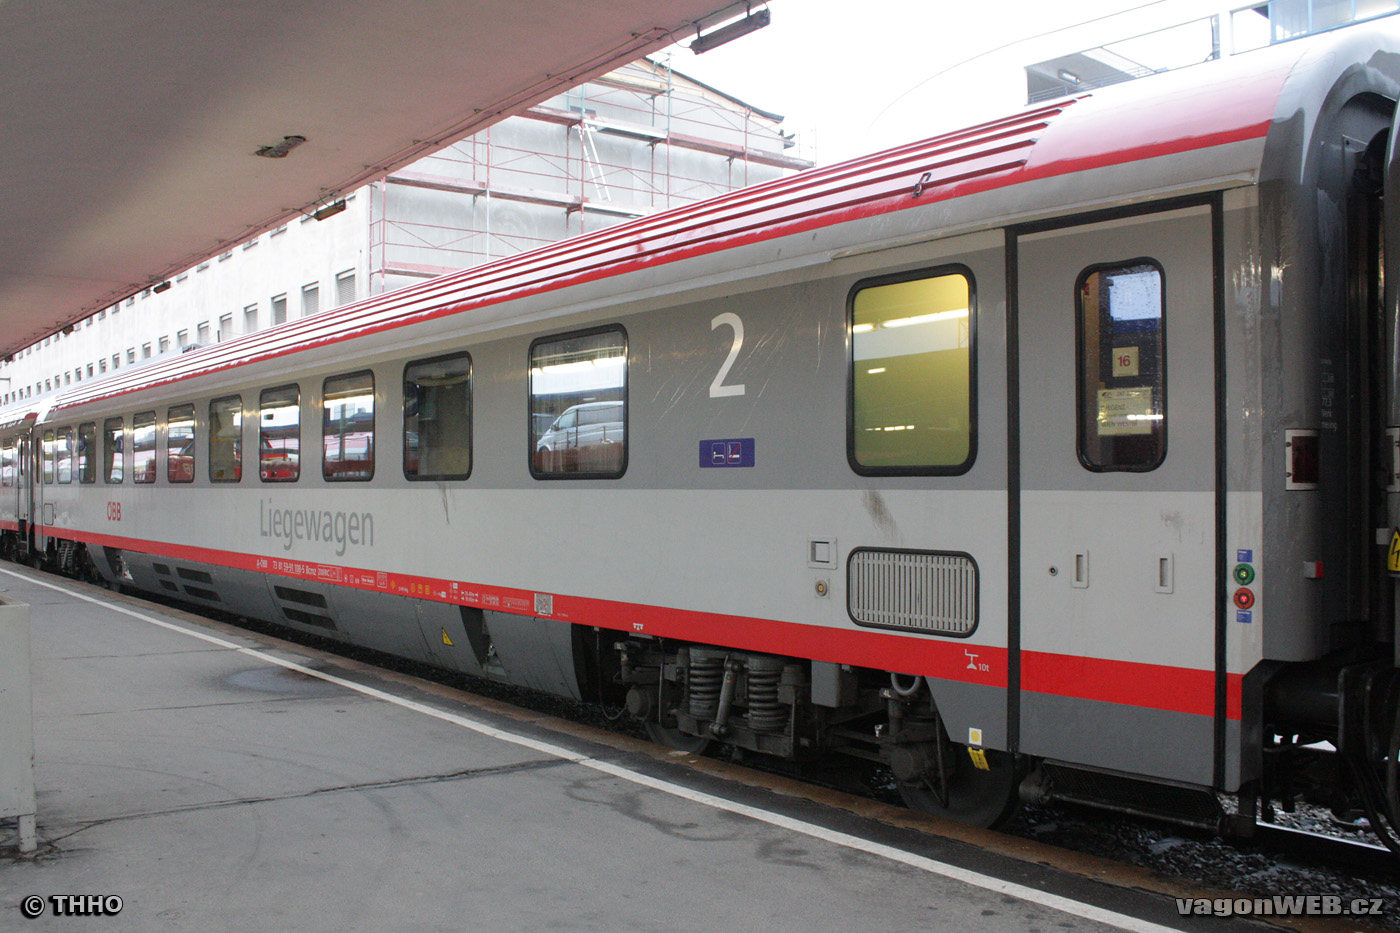 Couchetterijtuig van de ÖBB. ©THHO/vagonweb.cz